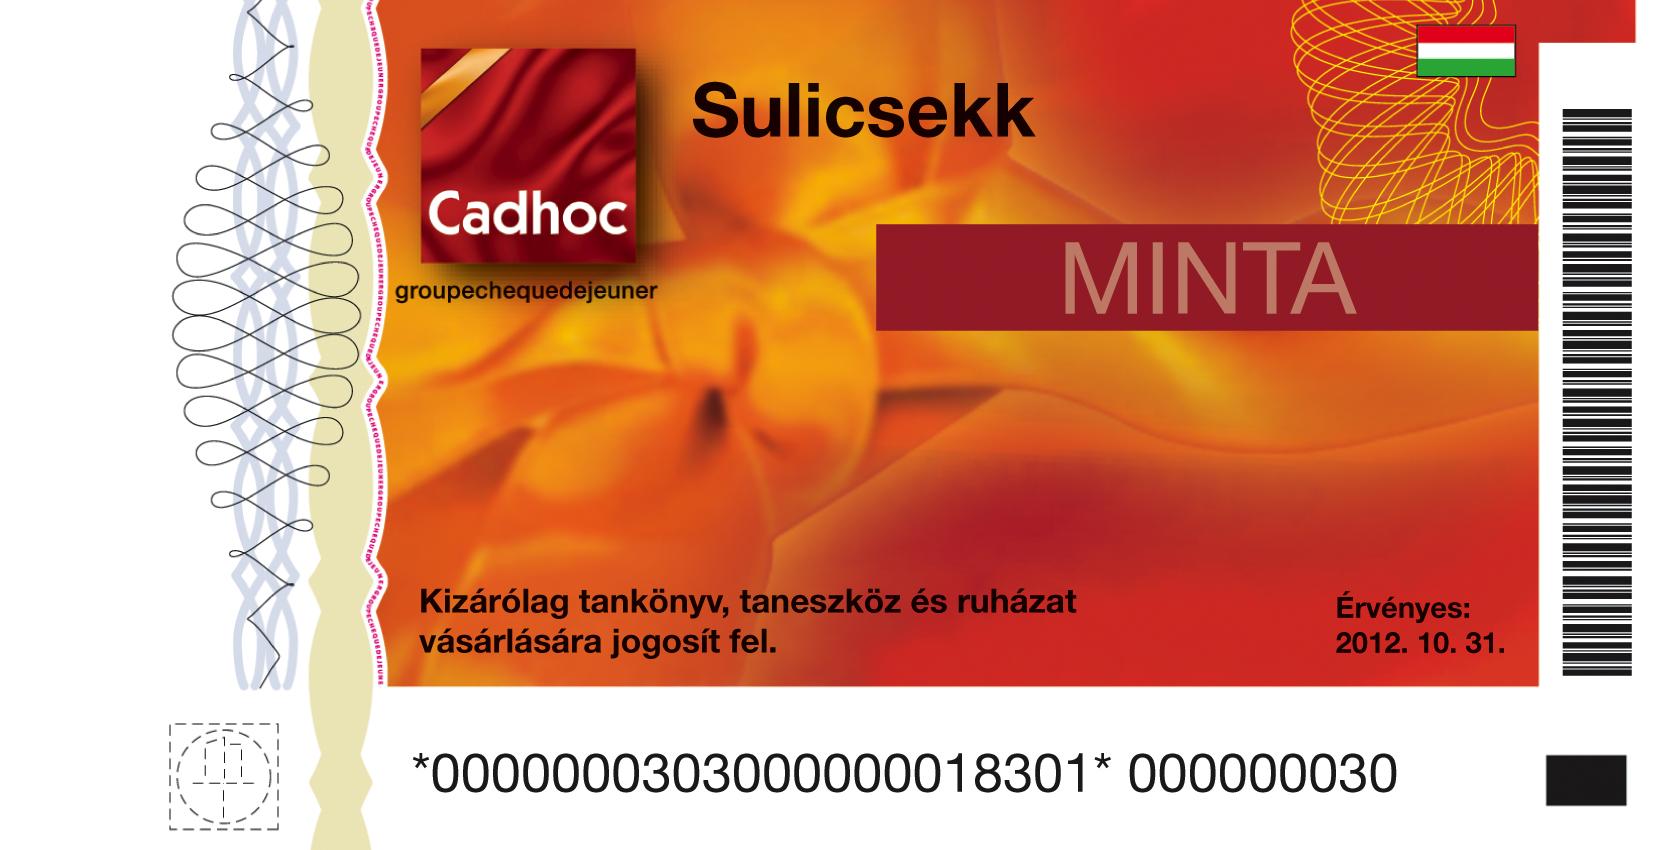 Sulicsekk